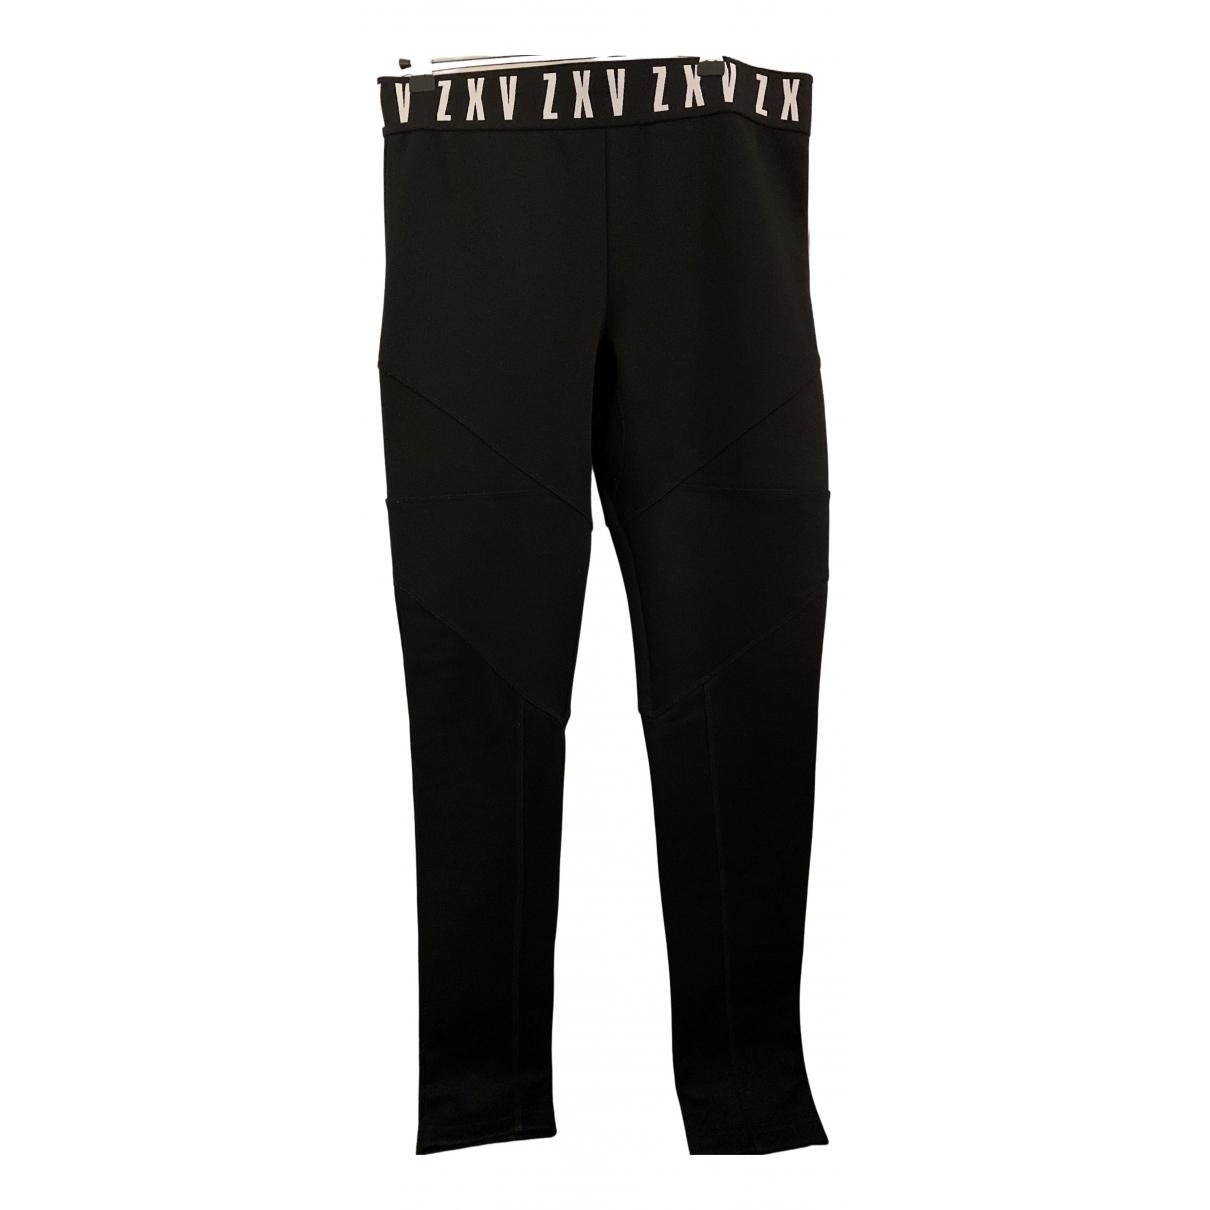 Pantalones en Algodon Negro Versus